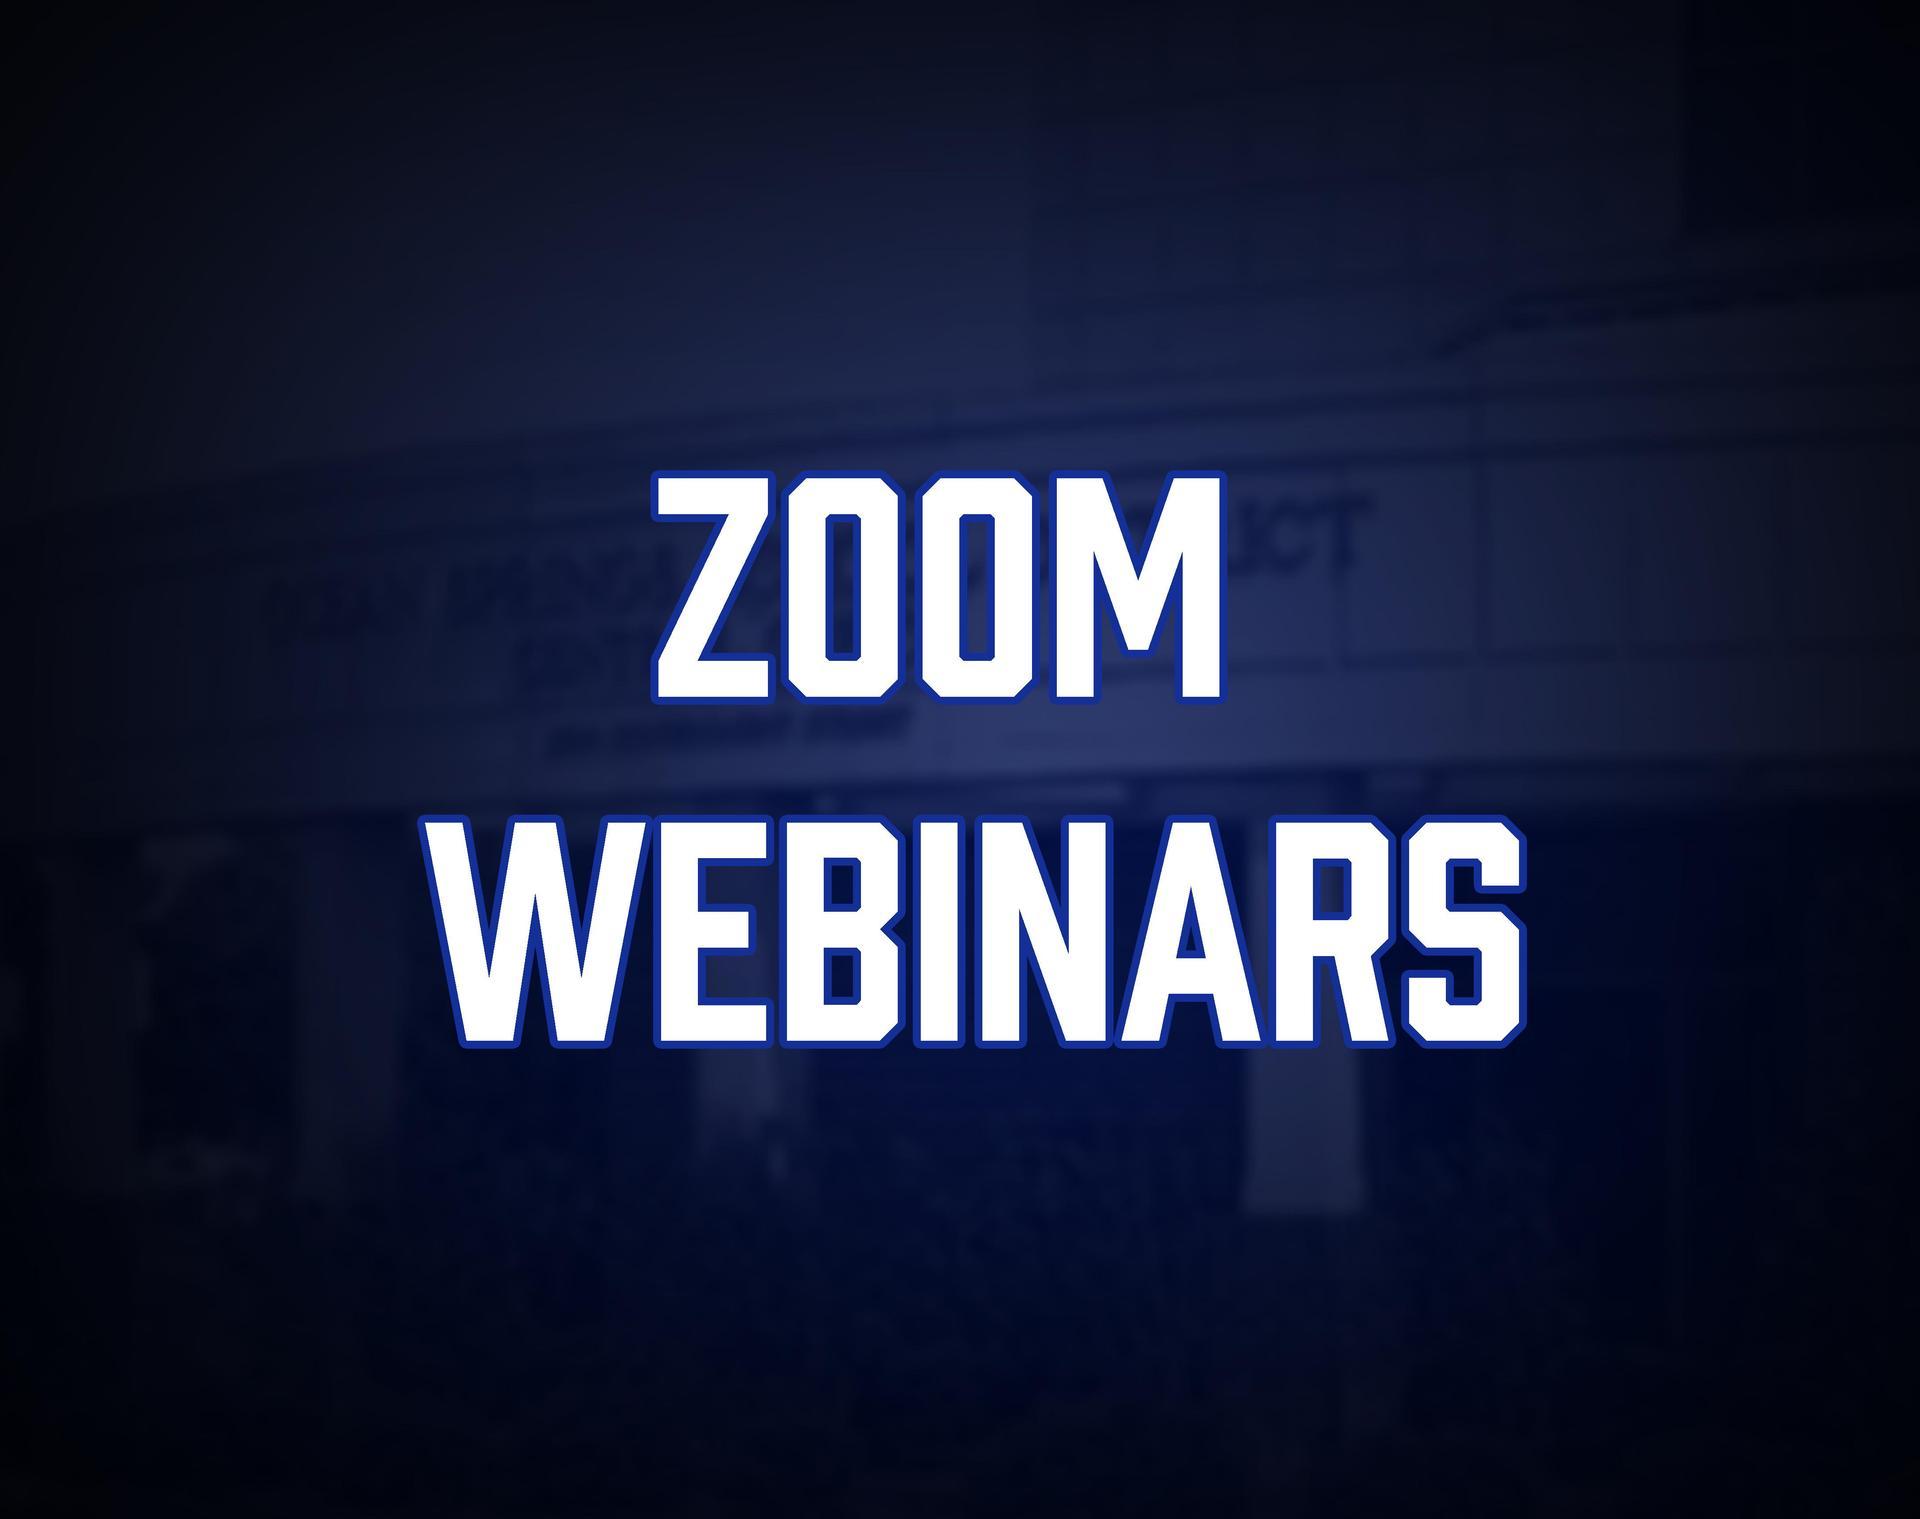 Zoom Webinars Tile